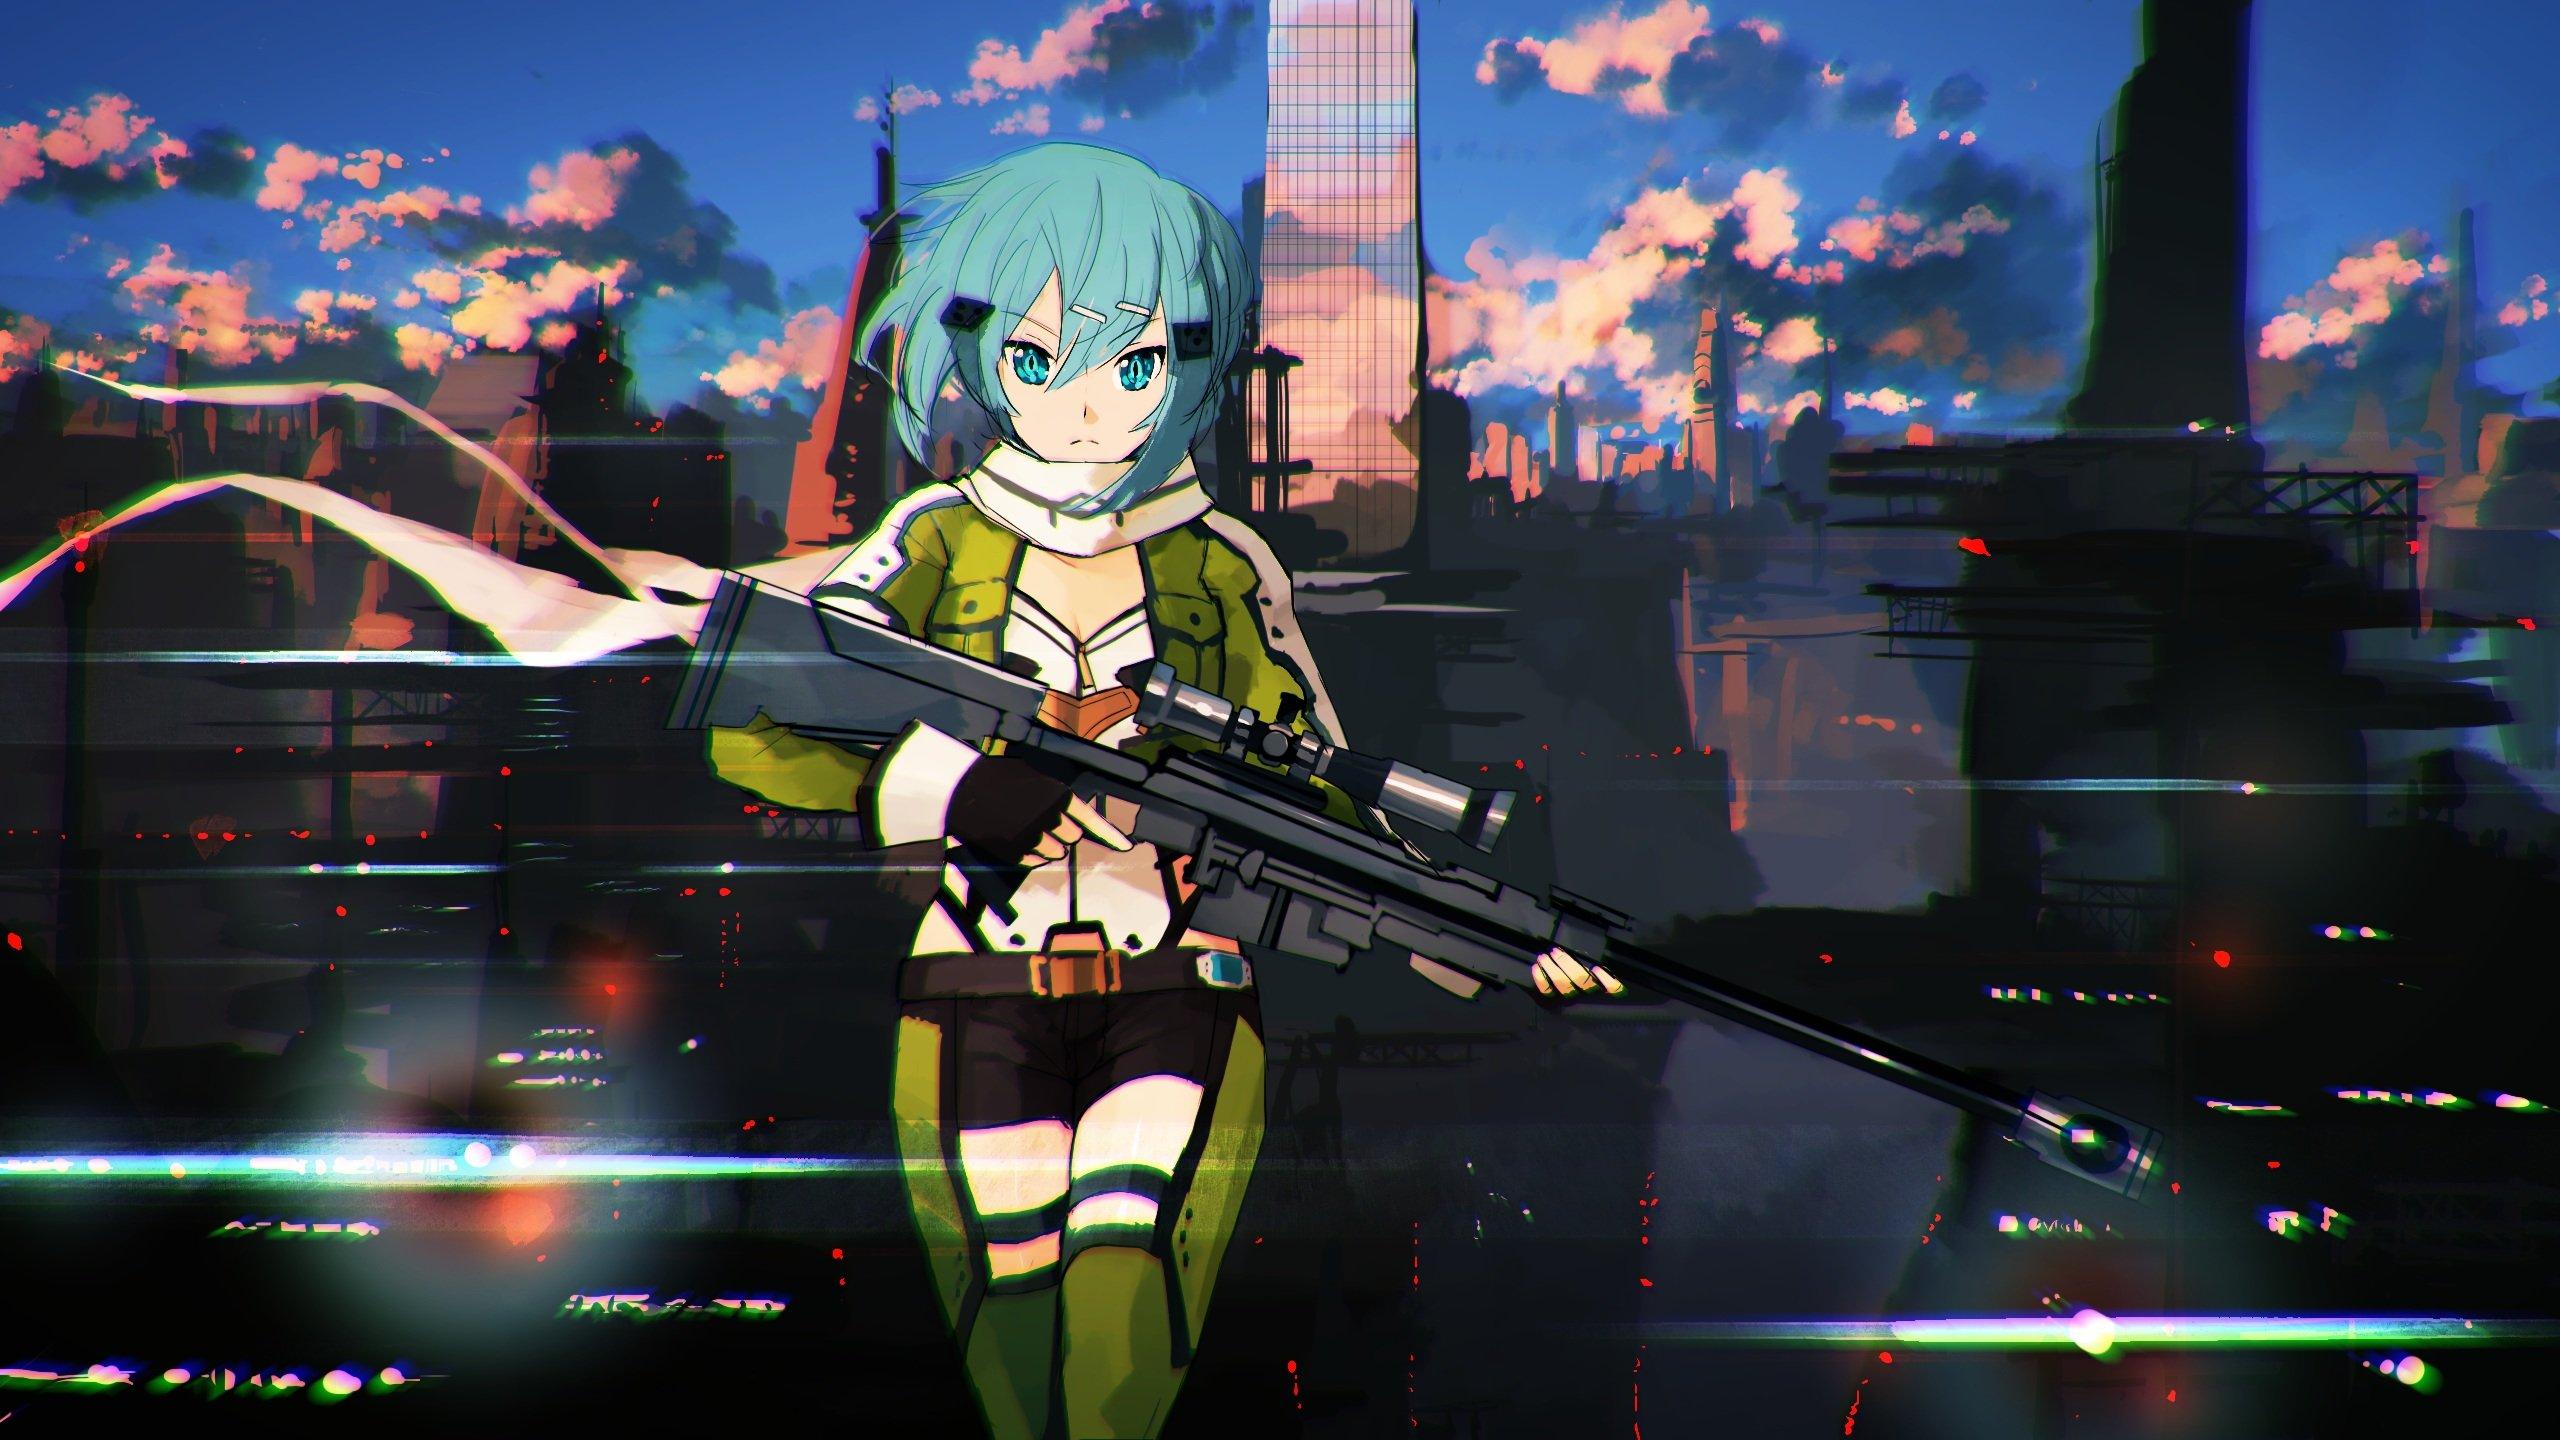 Fotos   Sao Gun Gale Online Ggo Hd Wallpaper 1920x1080 2560x1440